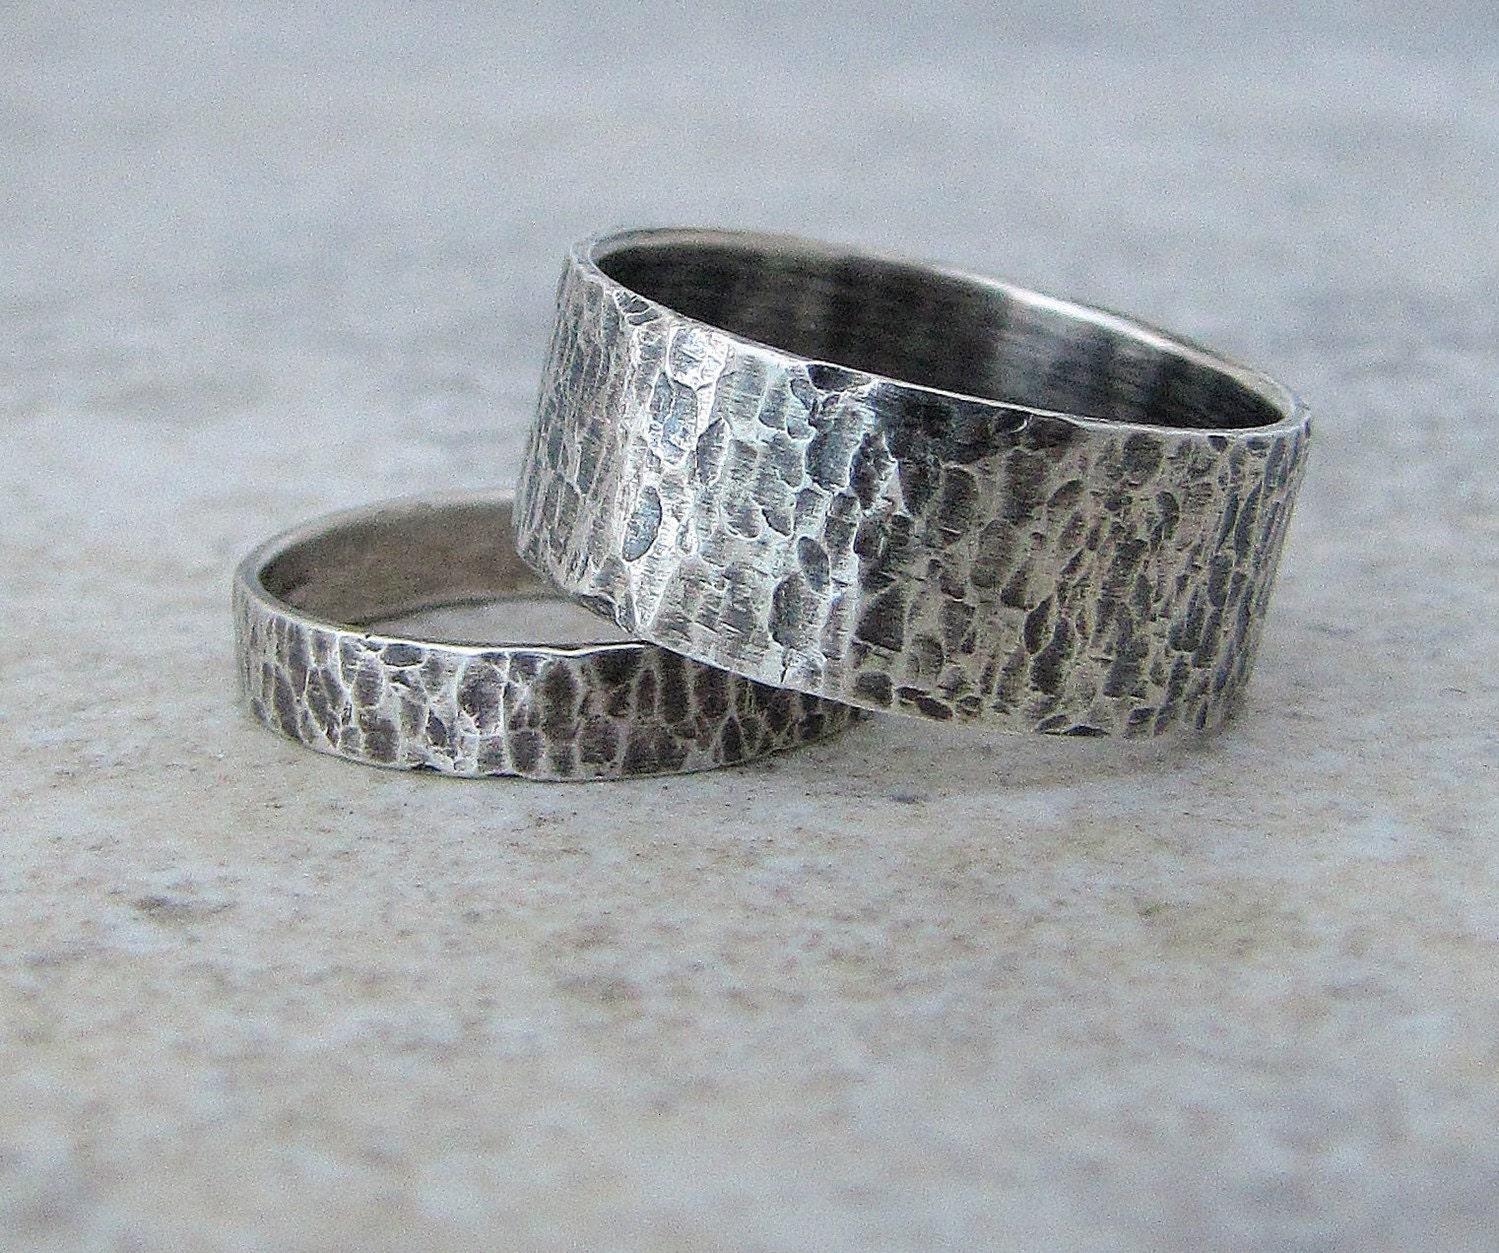 silver wedding bands hammered wedding rings silver rustic. Black Bedroom Furniture Sets. Home Design Ideas